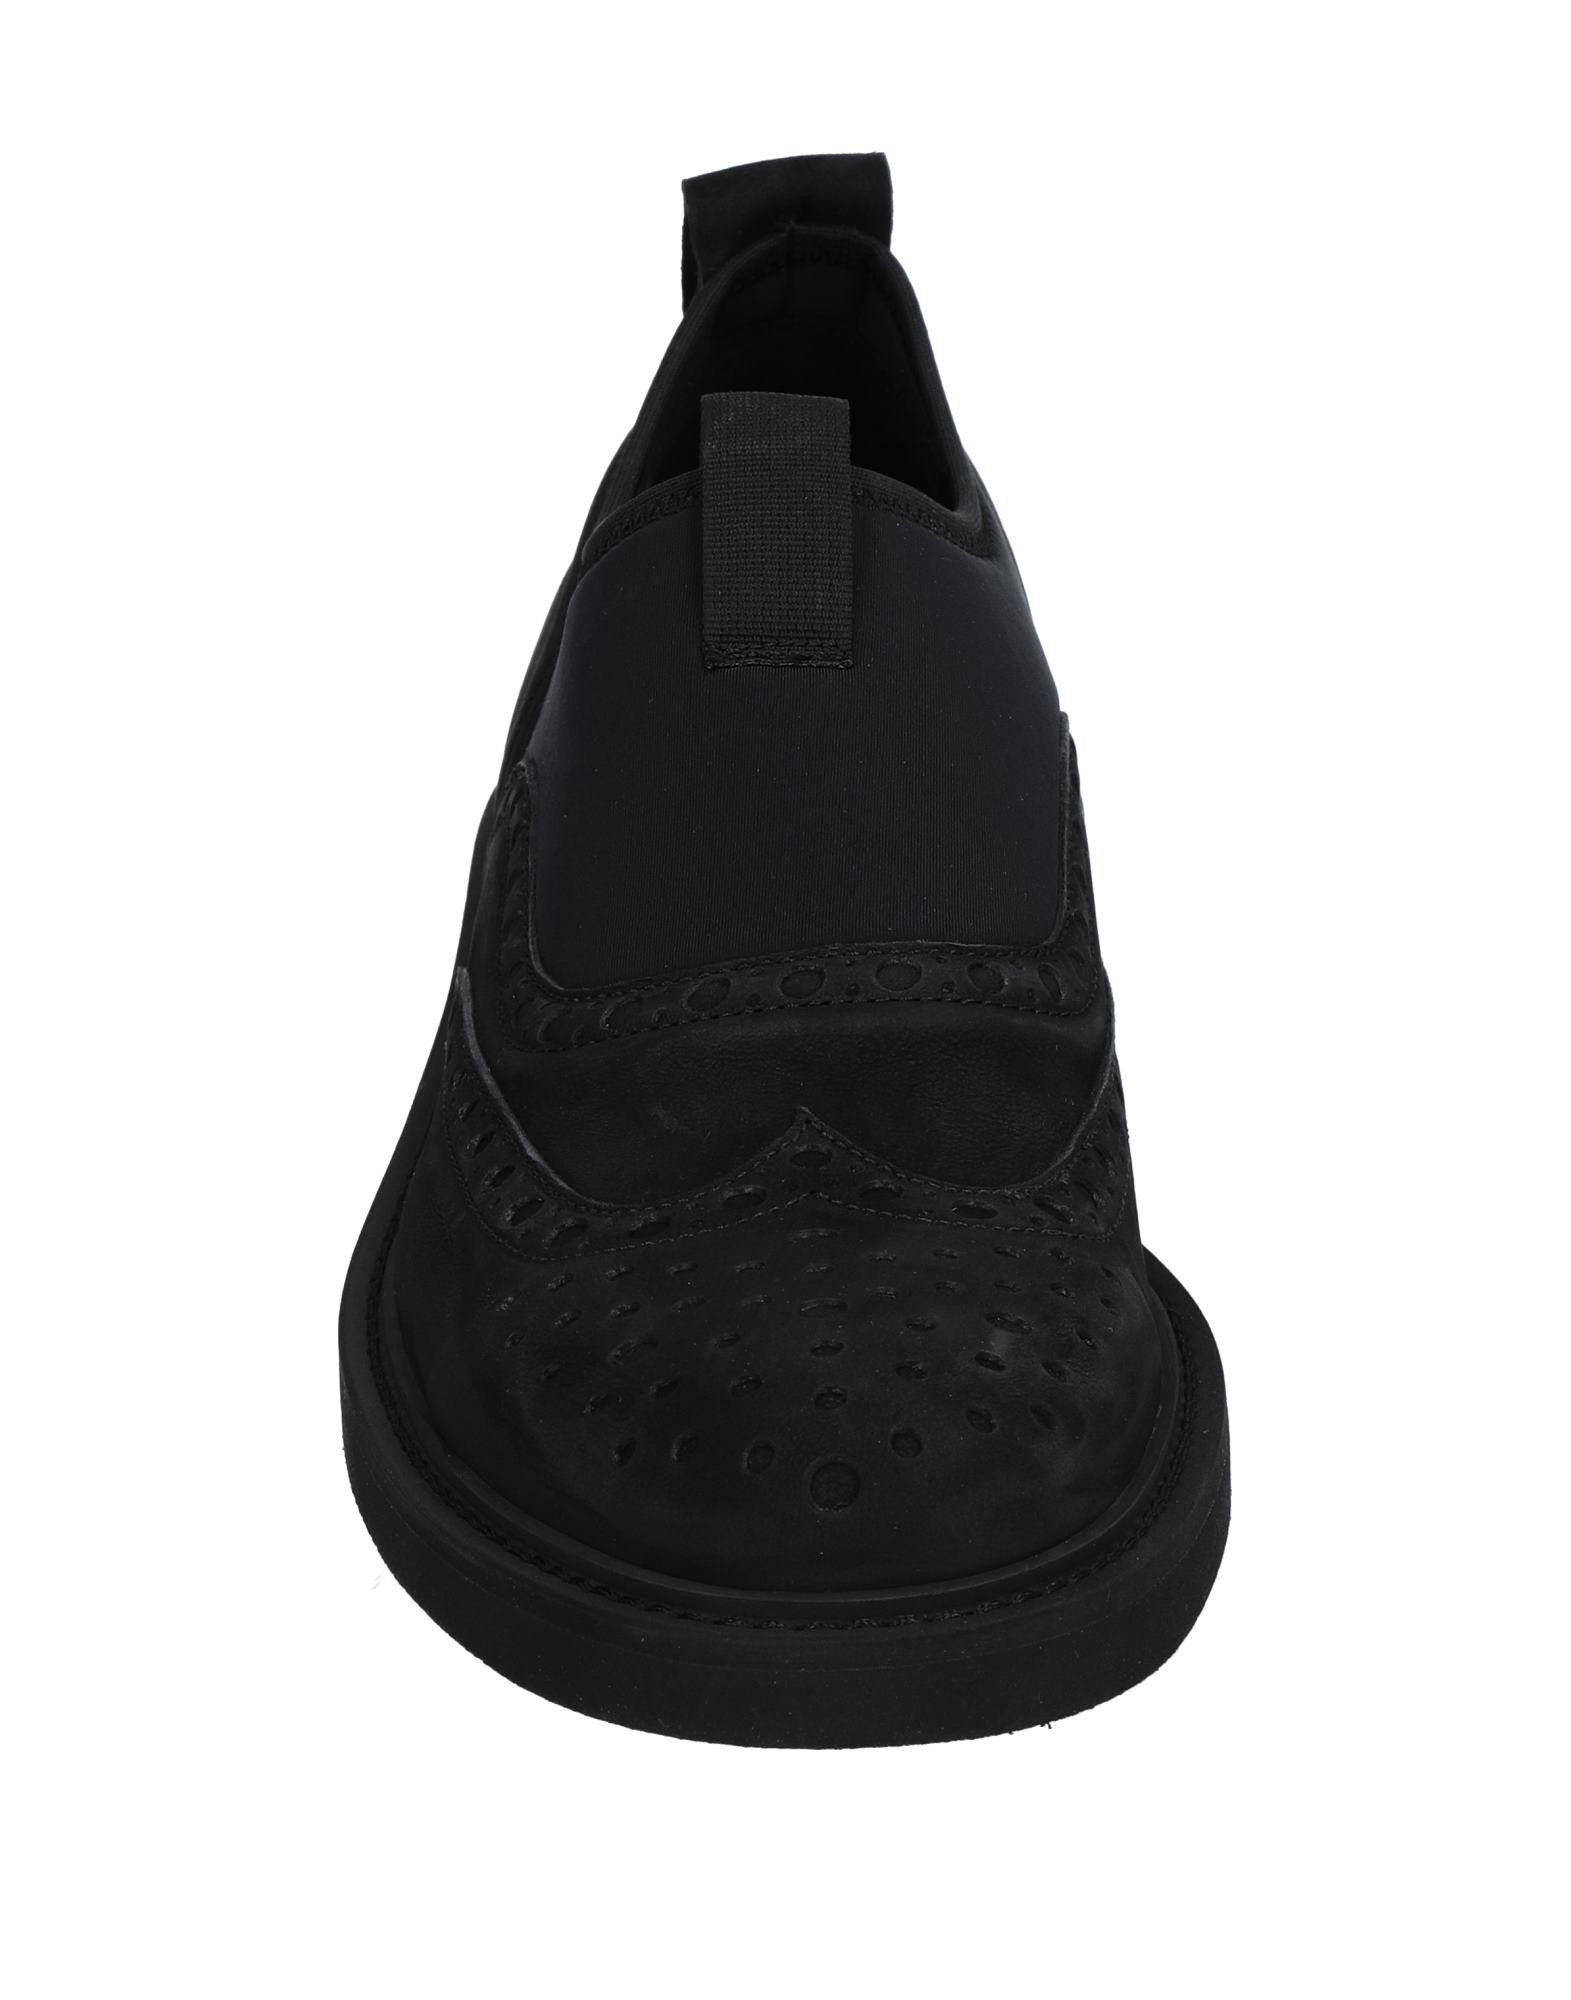 Bruno Bordese Gute Mokassins Herren  11530028VB Gute Bordese Qualität beliebte Schuhe 3fbadd